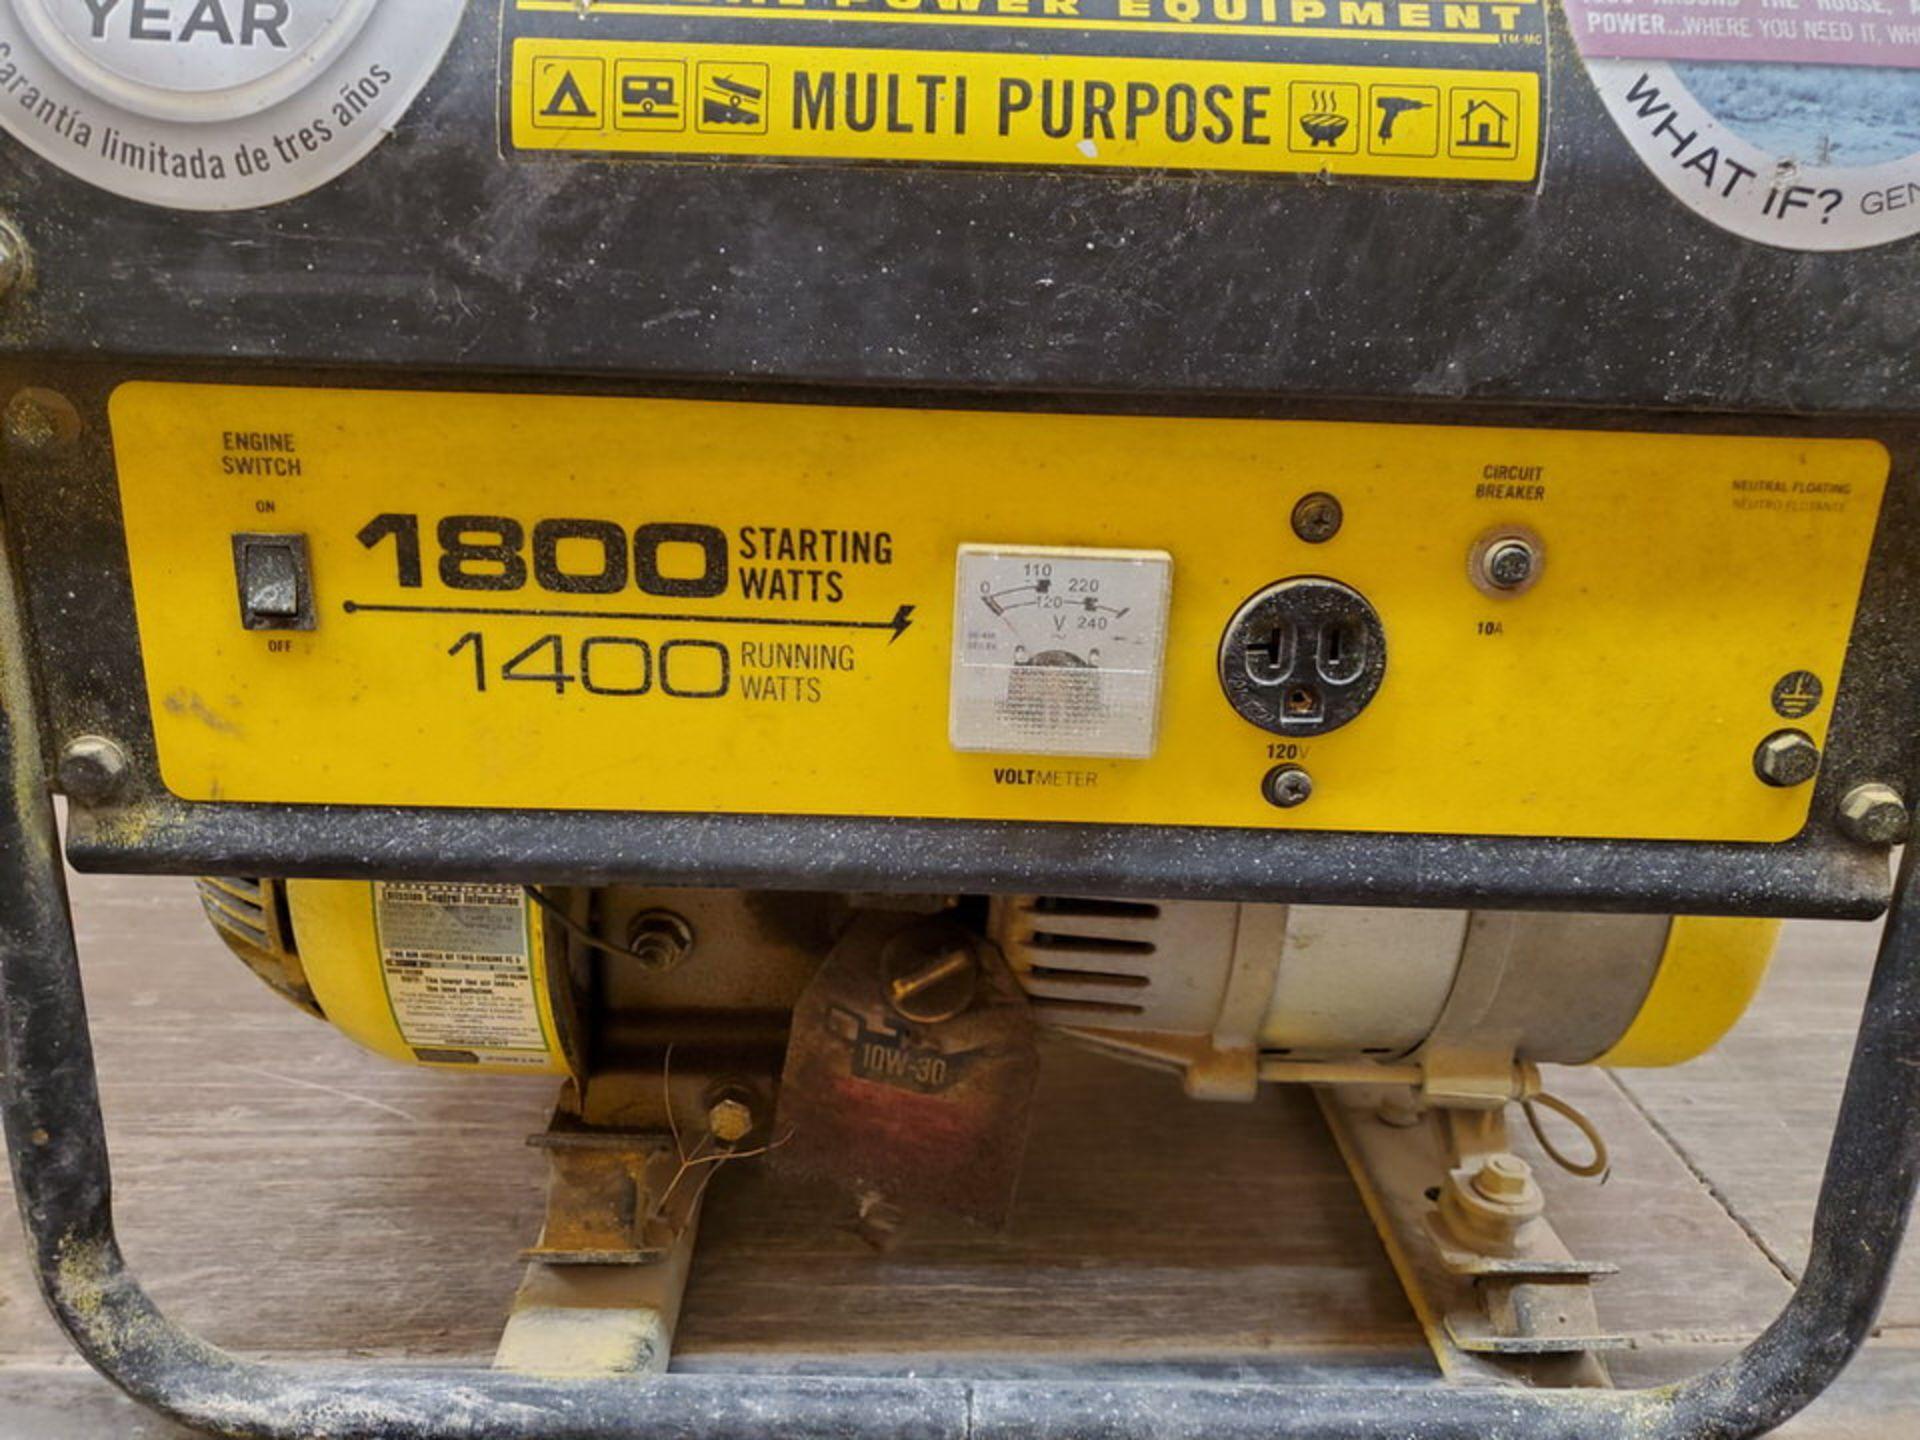 Champion 42432 Portable Generator 1400W, W/ 80cc Engine, 1PH, 60HZ, 120V, 11.7A - Image 5 of 7